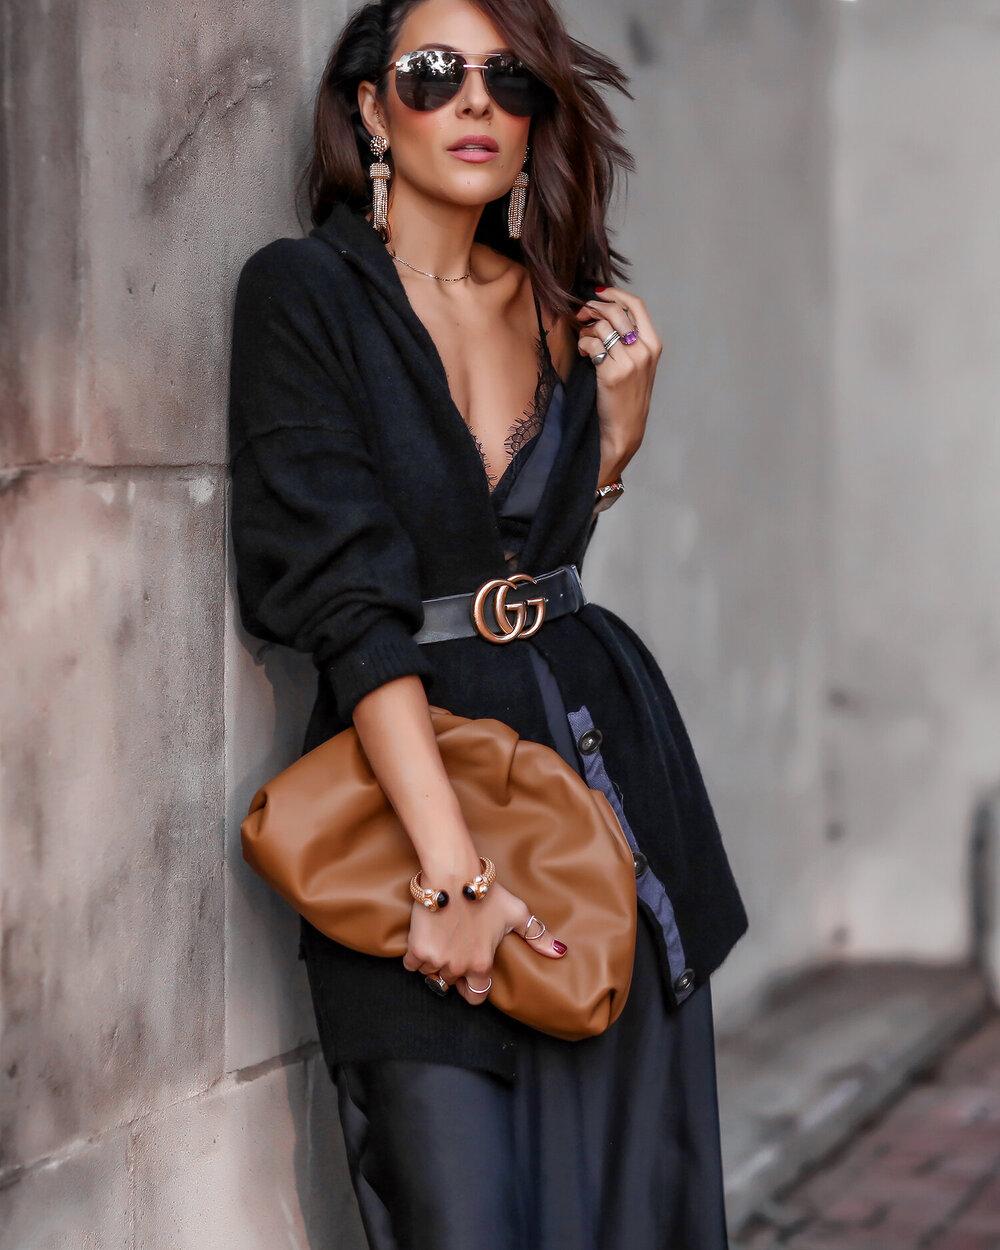 02-Nordstrom+Designer+Sale+Chloe+Boots+Bottega+Veneta+Pouch